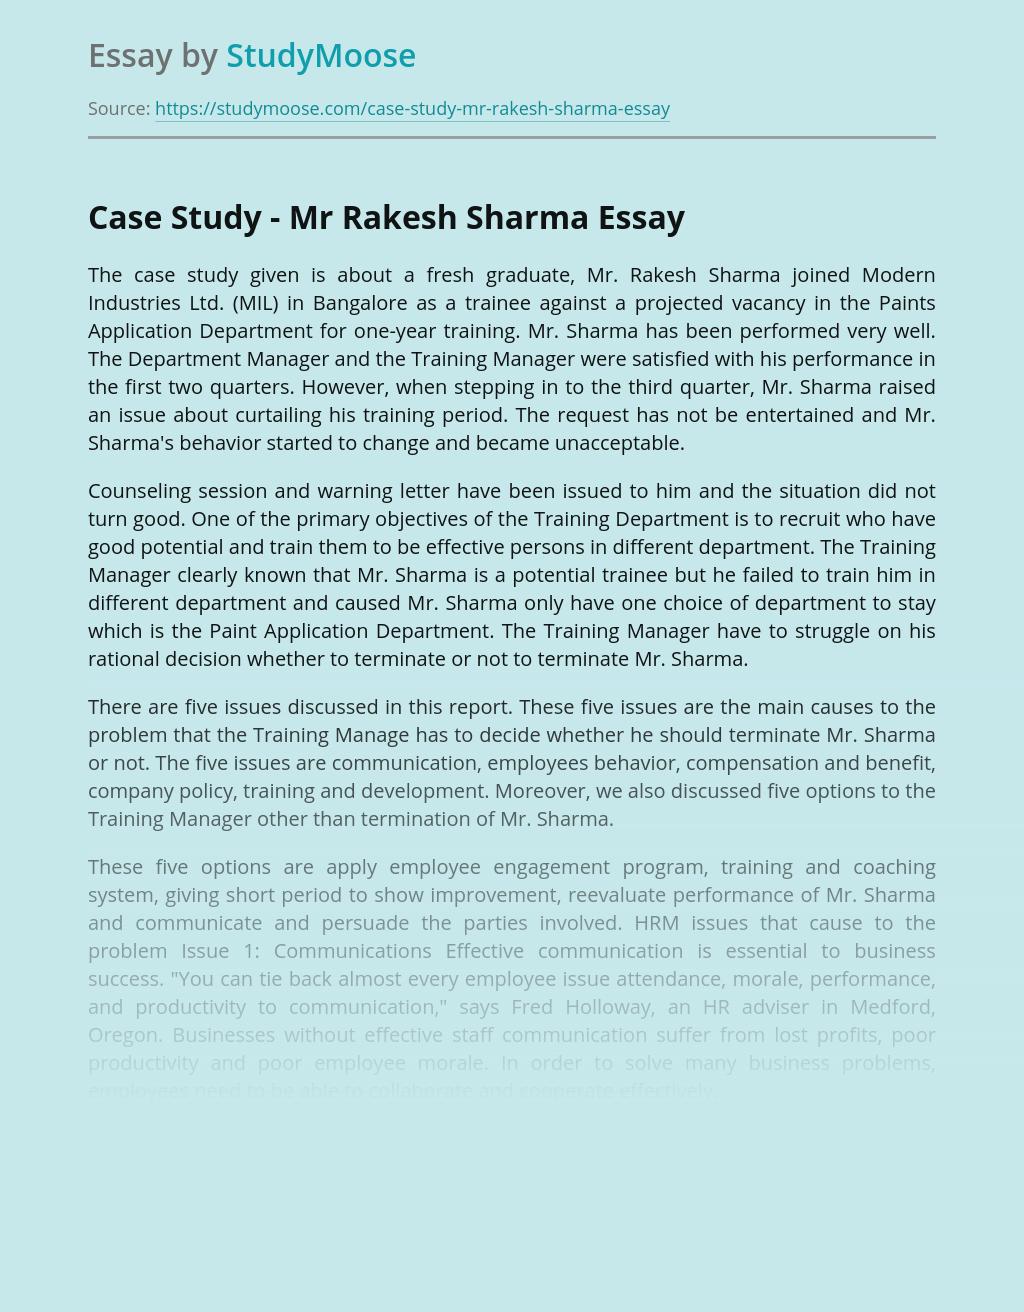 Case Study - Mr Rakesh Sharma